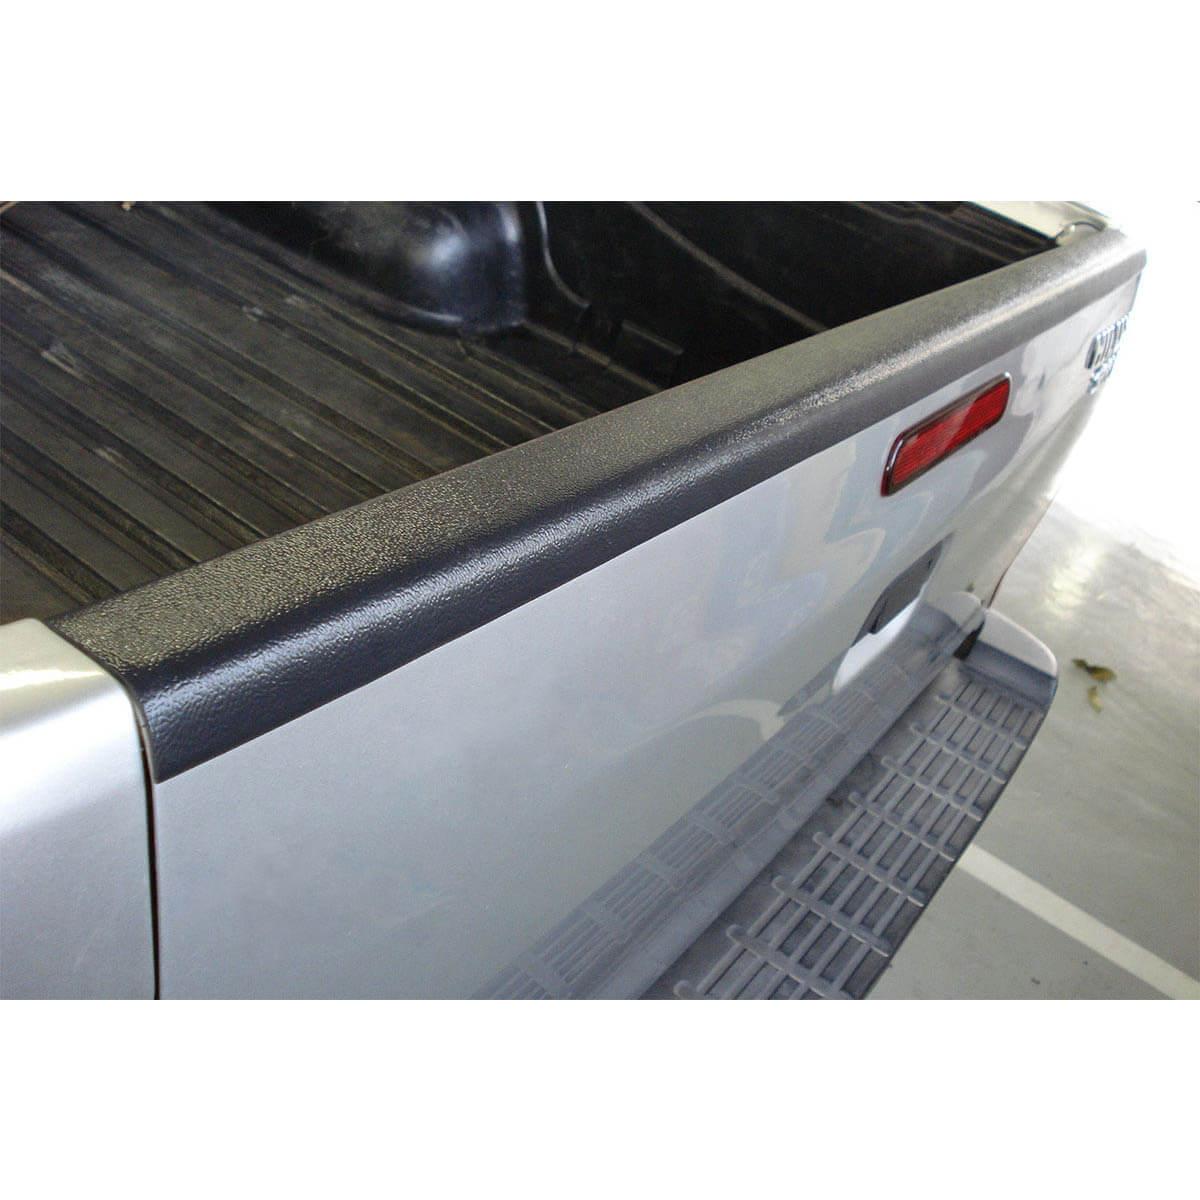 Protetor borda tampa caçamba Bepo Nova S10 cabine dupla 2012 a 2018